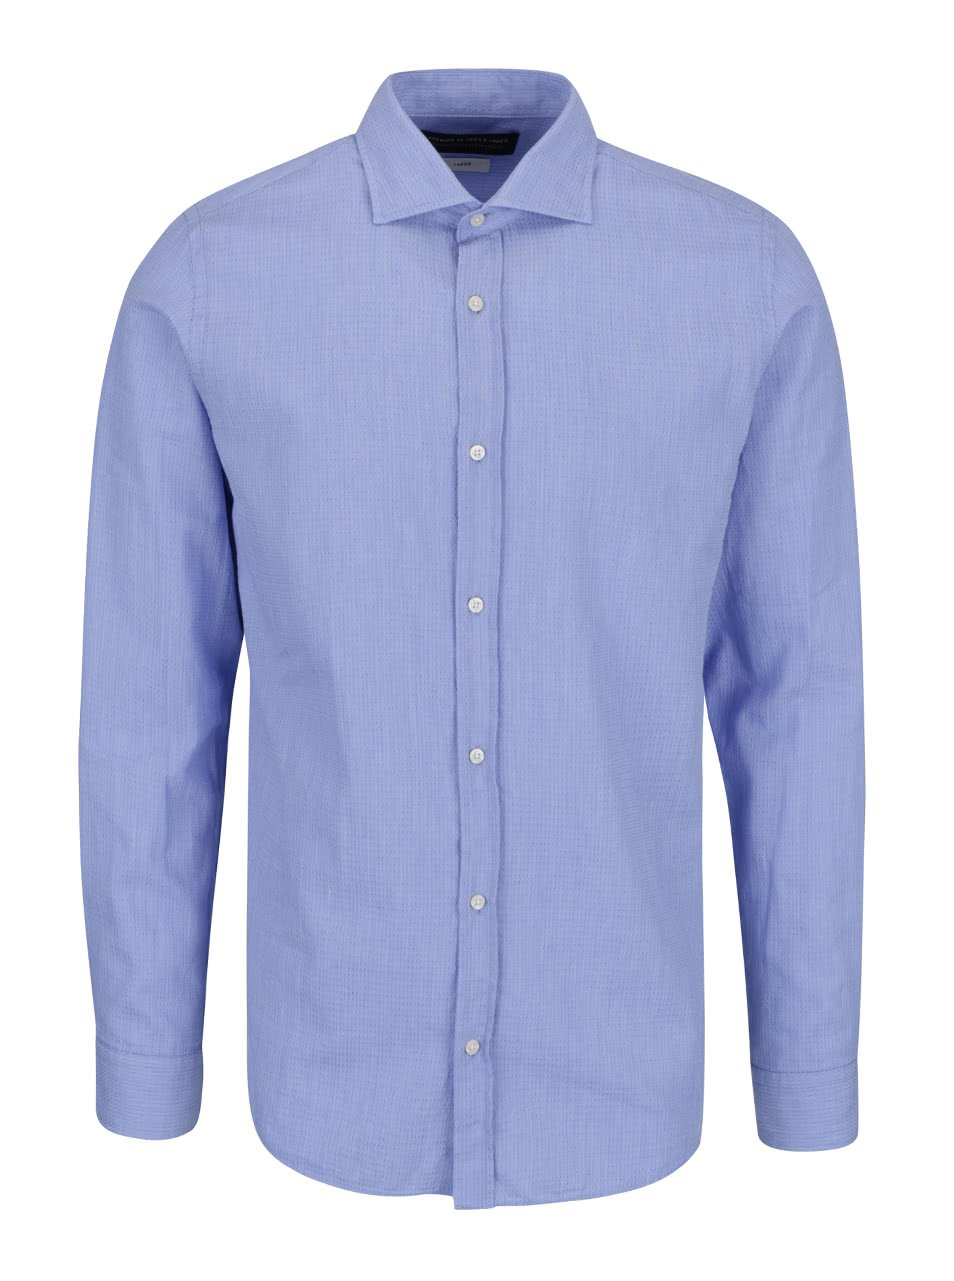 Modrá slim fit košile s jemným vzorem Jack & Jones Ethan